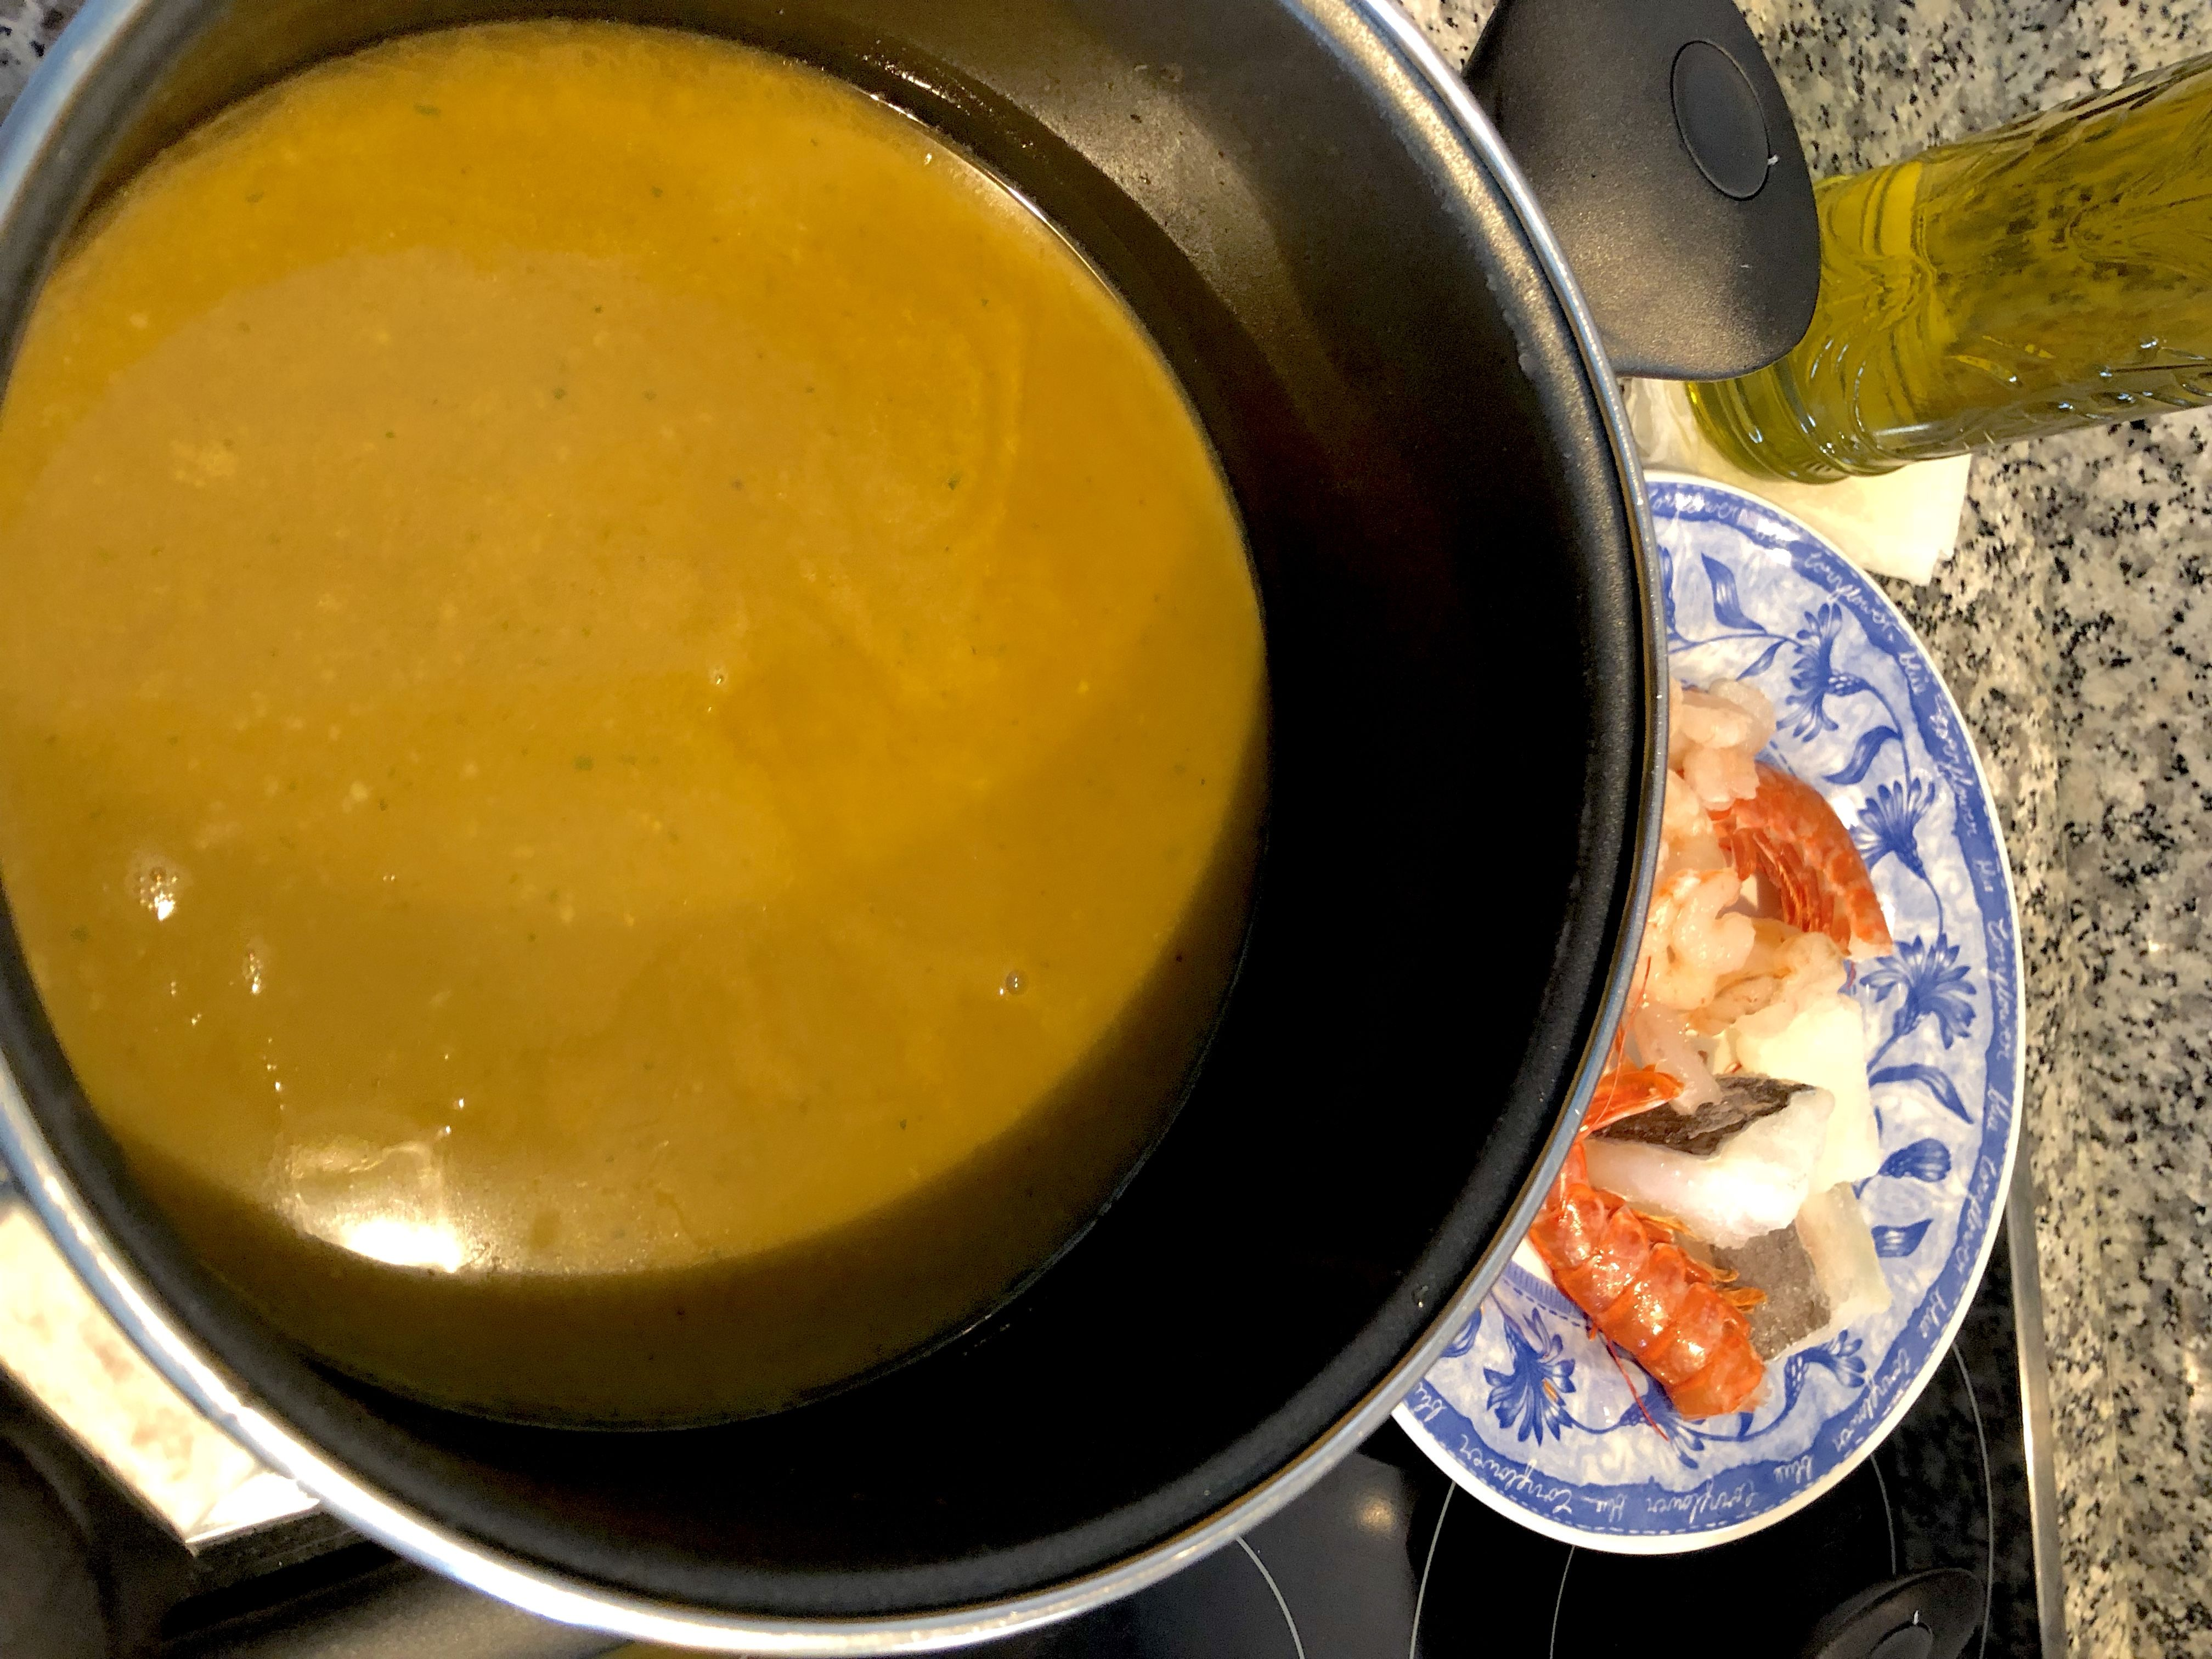 Fumet de gambón y pescado | Receta | Recetas de comida. Robot de cocina. Pescado